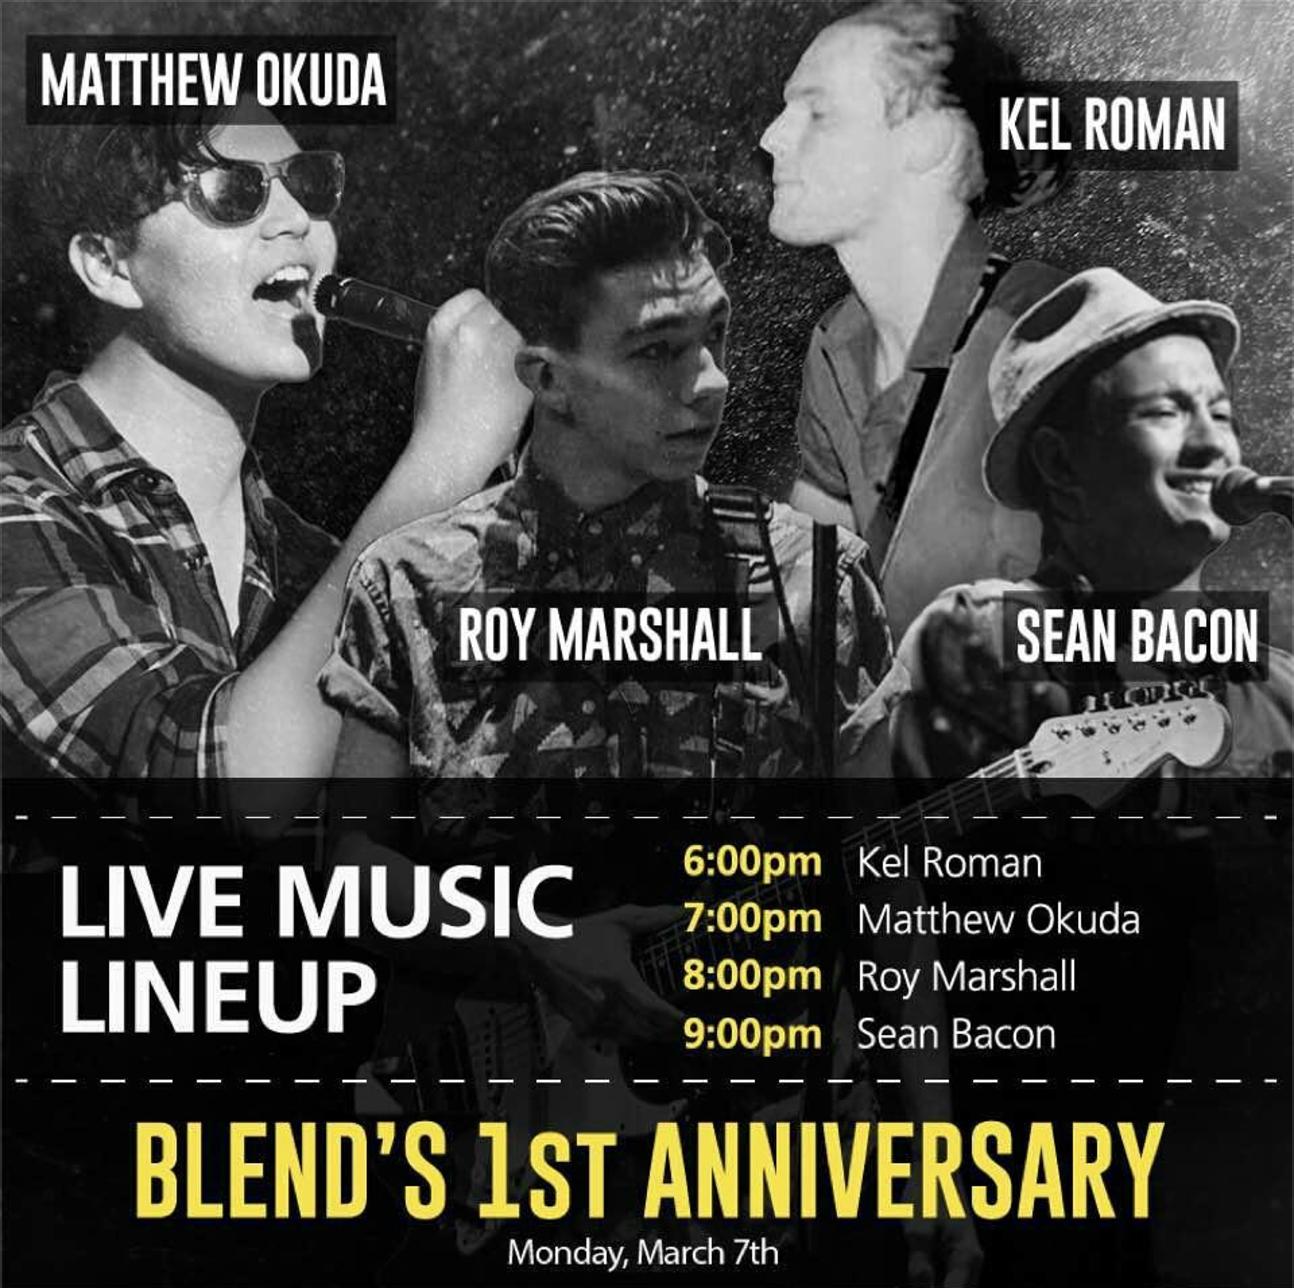 Blend 1st Anniversary Live Music